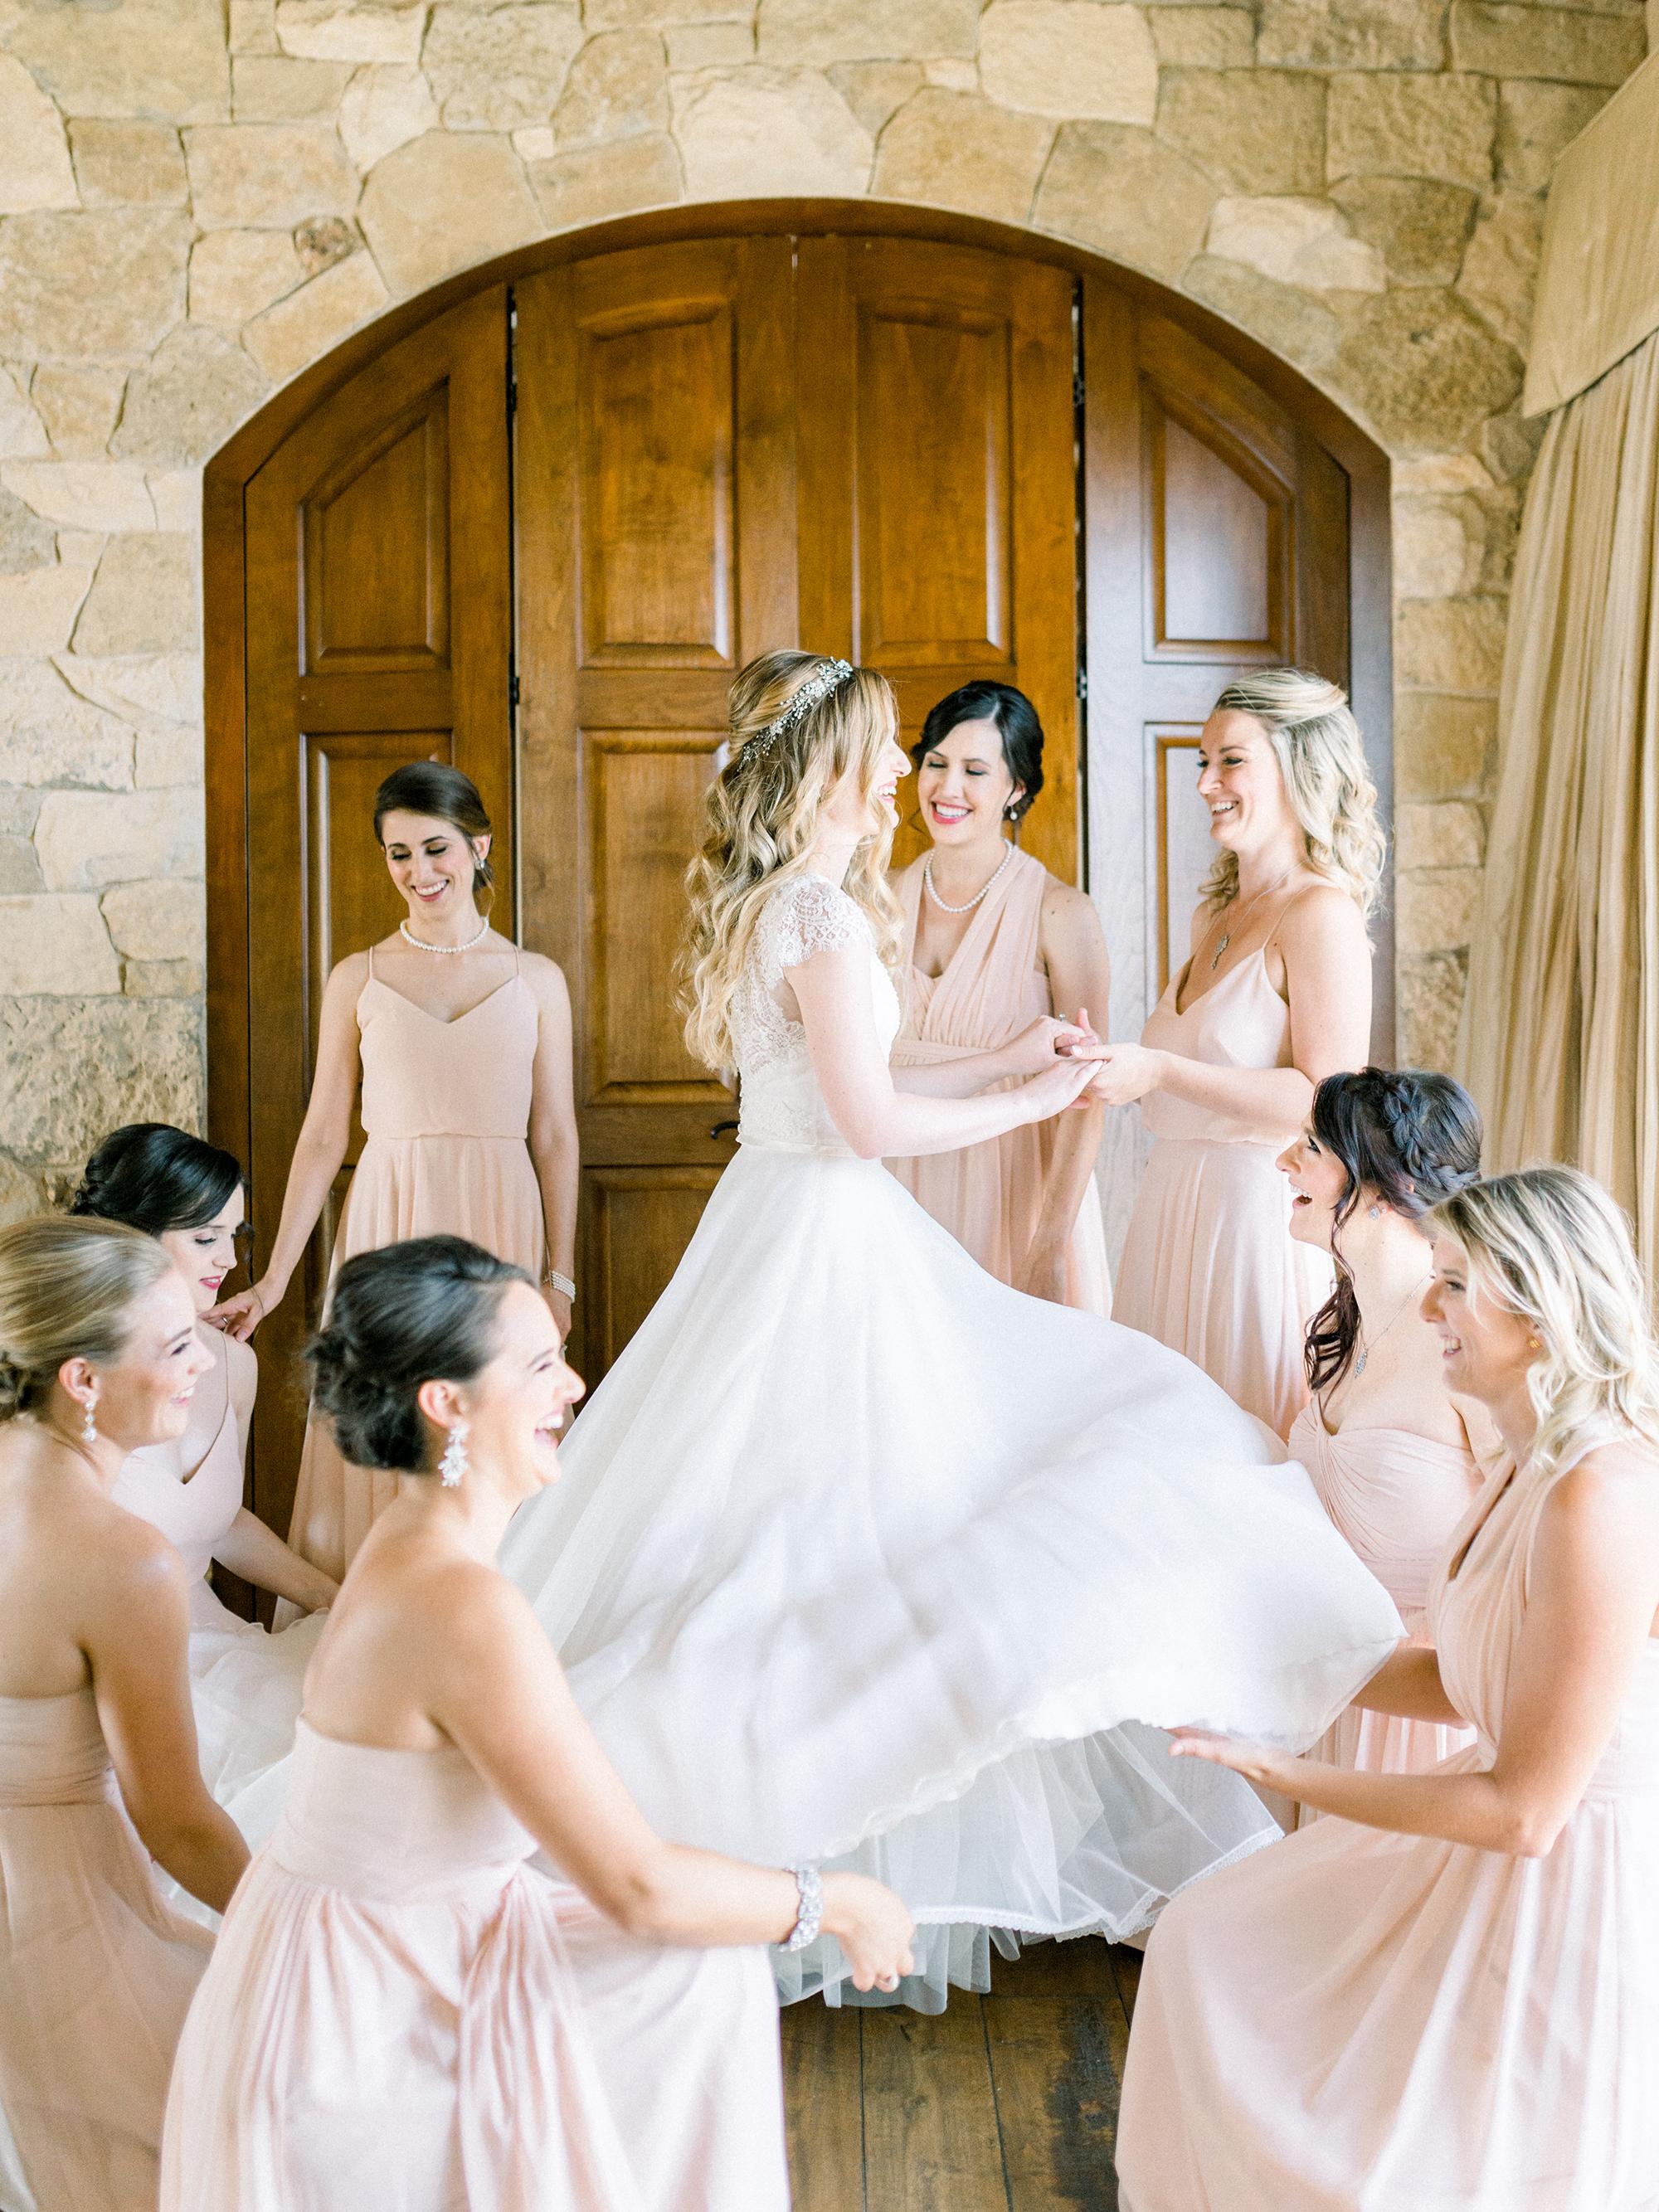 bridal party helping bride get dressed